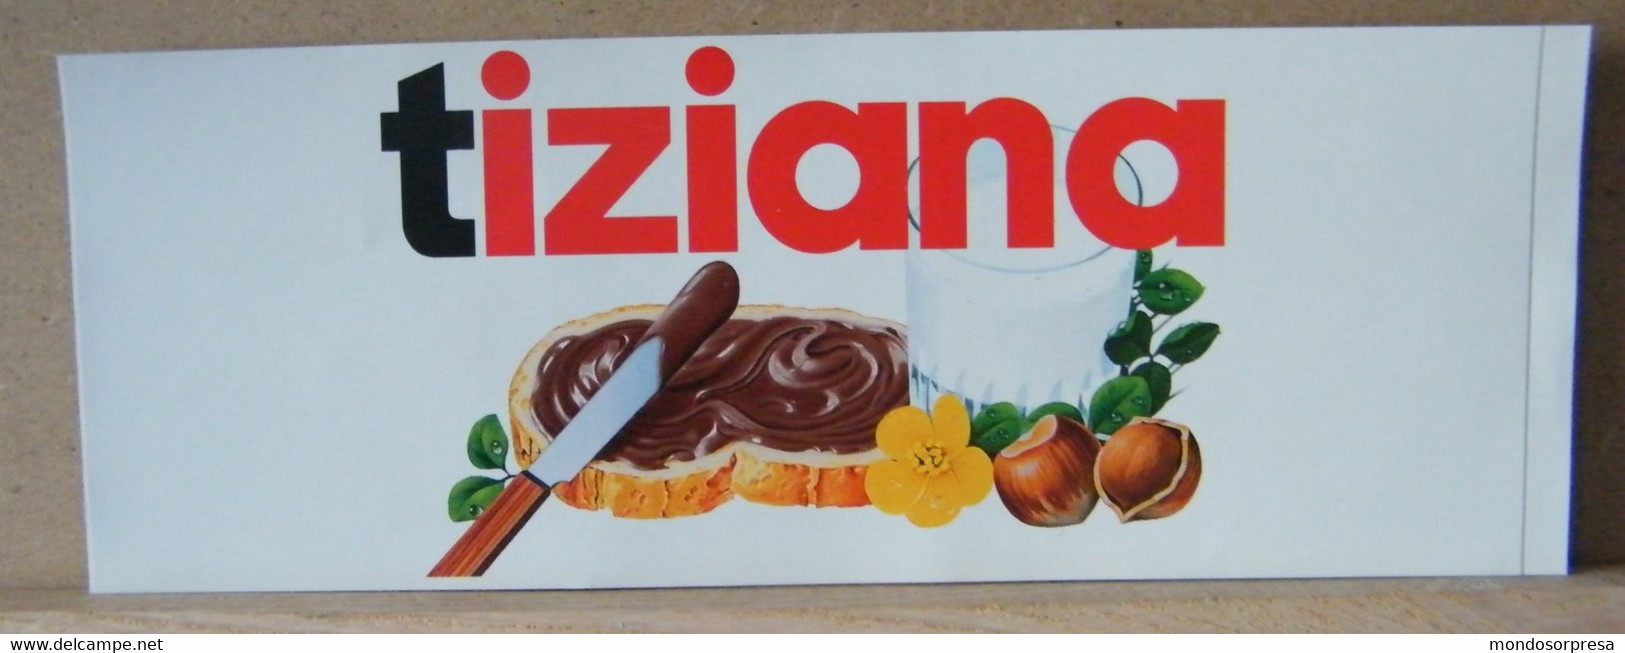 MONDOSORPRESA, ADESIVI NUTELLA NOMI, TIZIANA - Nutella